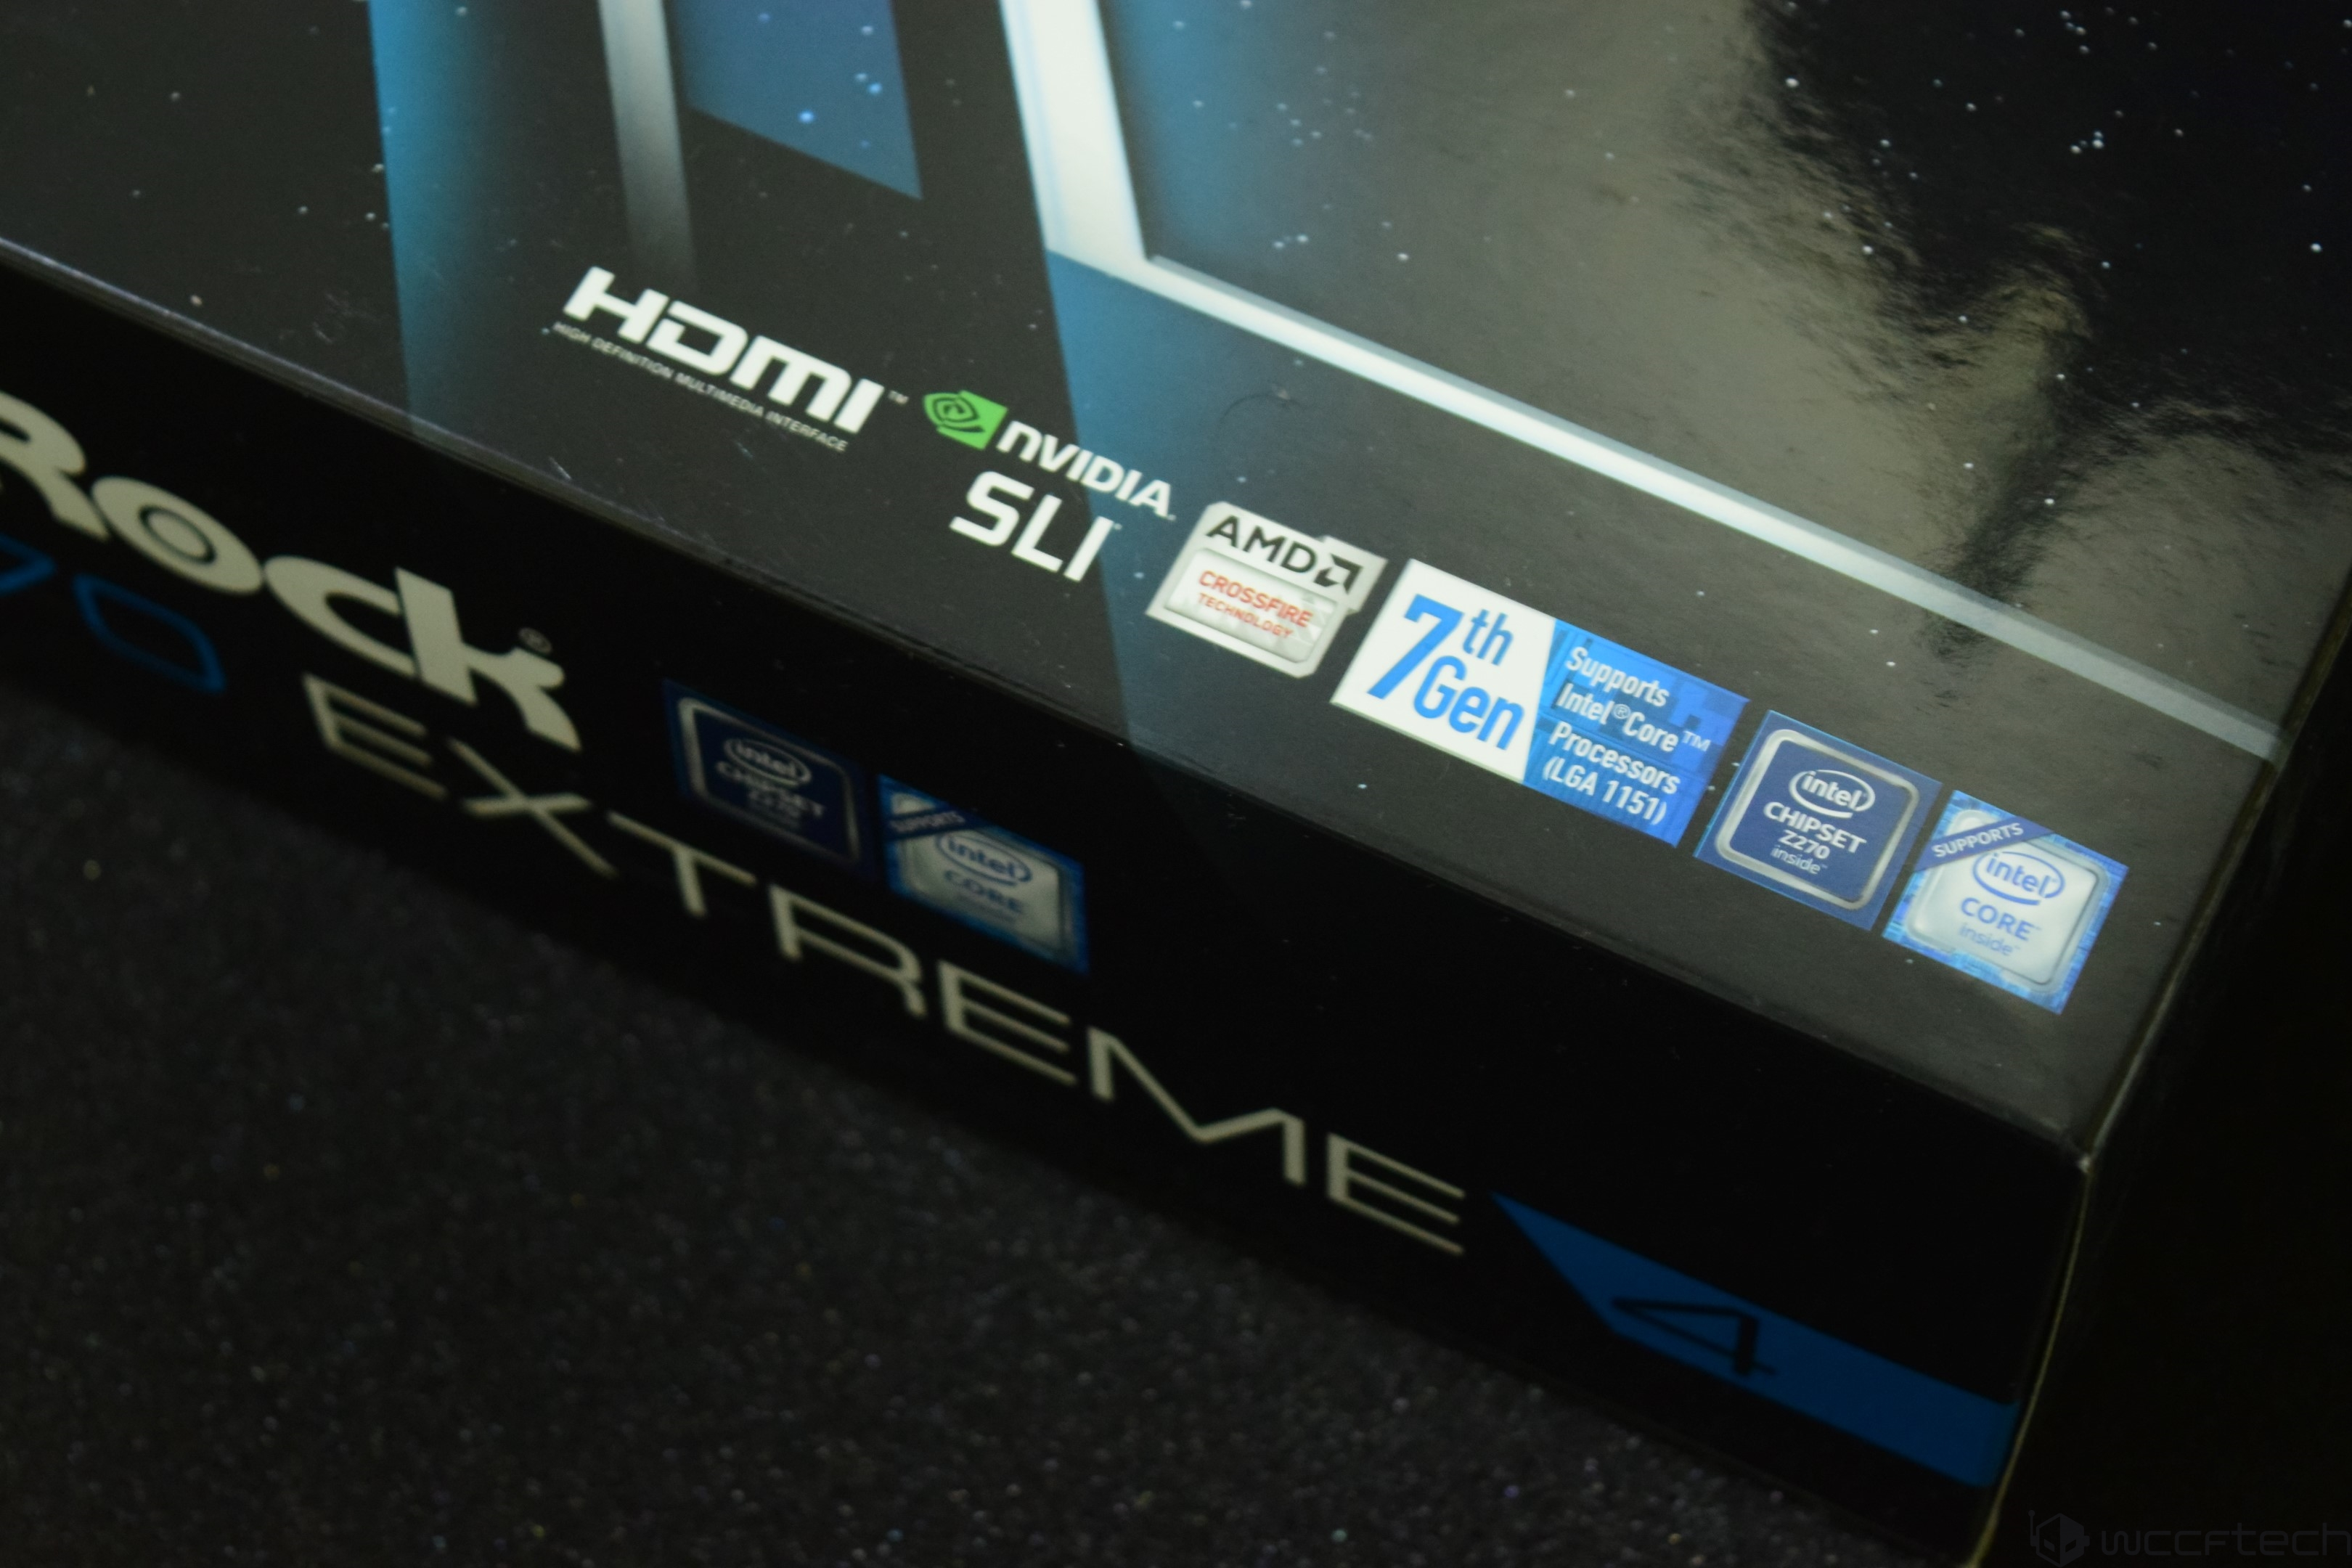 ASRock Z270 Extreme 4 LGA 1151 Motherboard Review – ASRock Z270